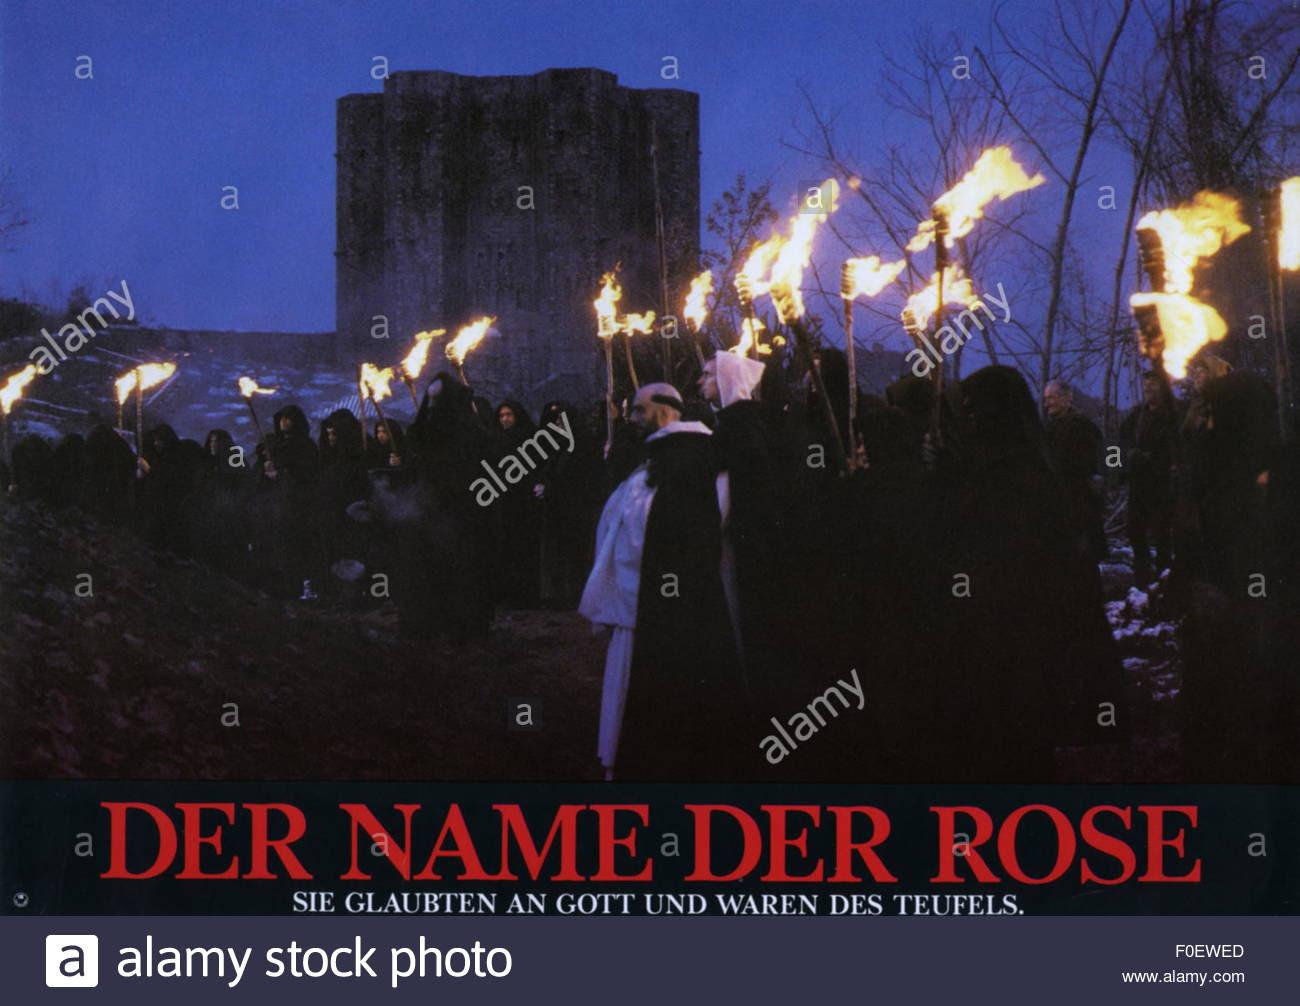 Bildergebnis für il nome della rosa qualtinger